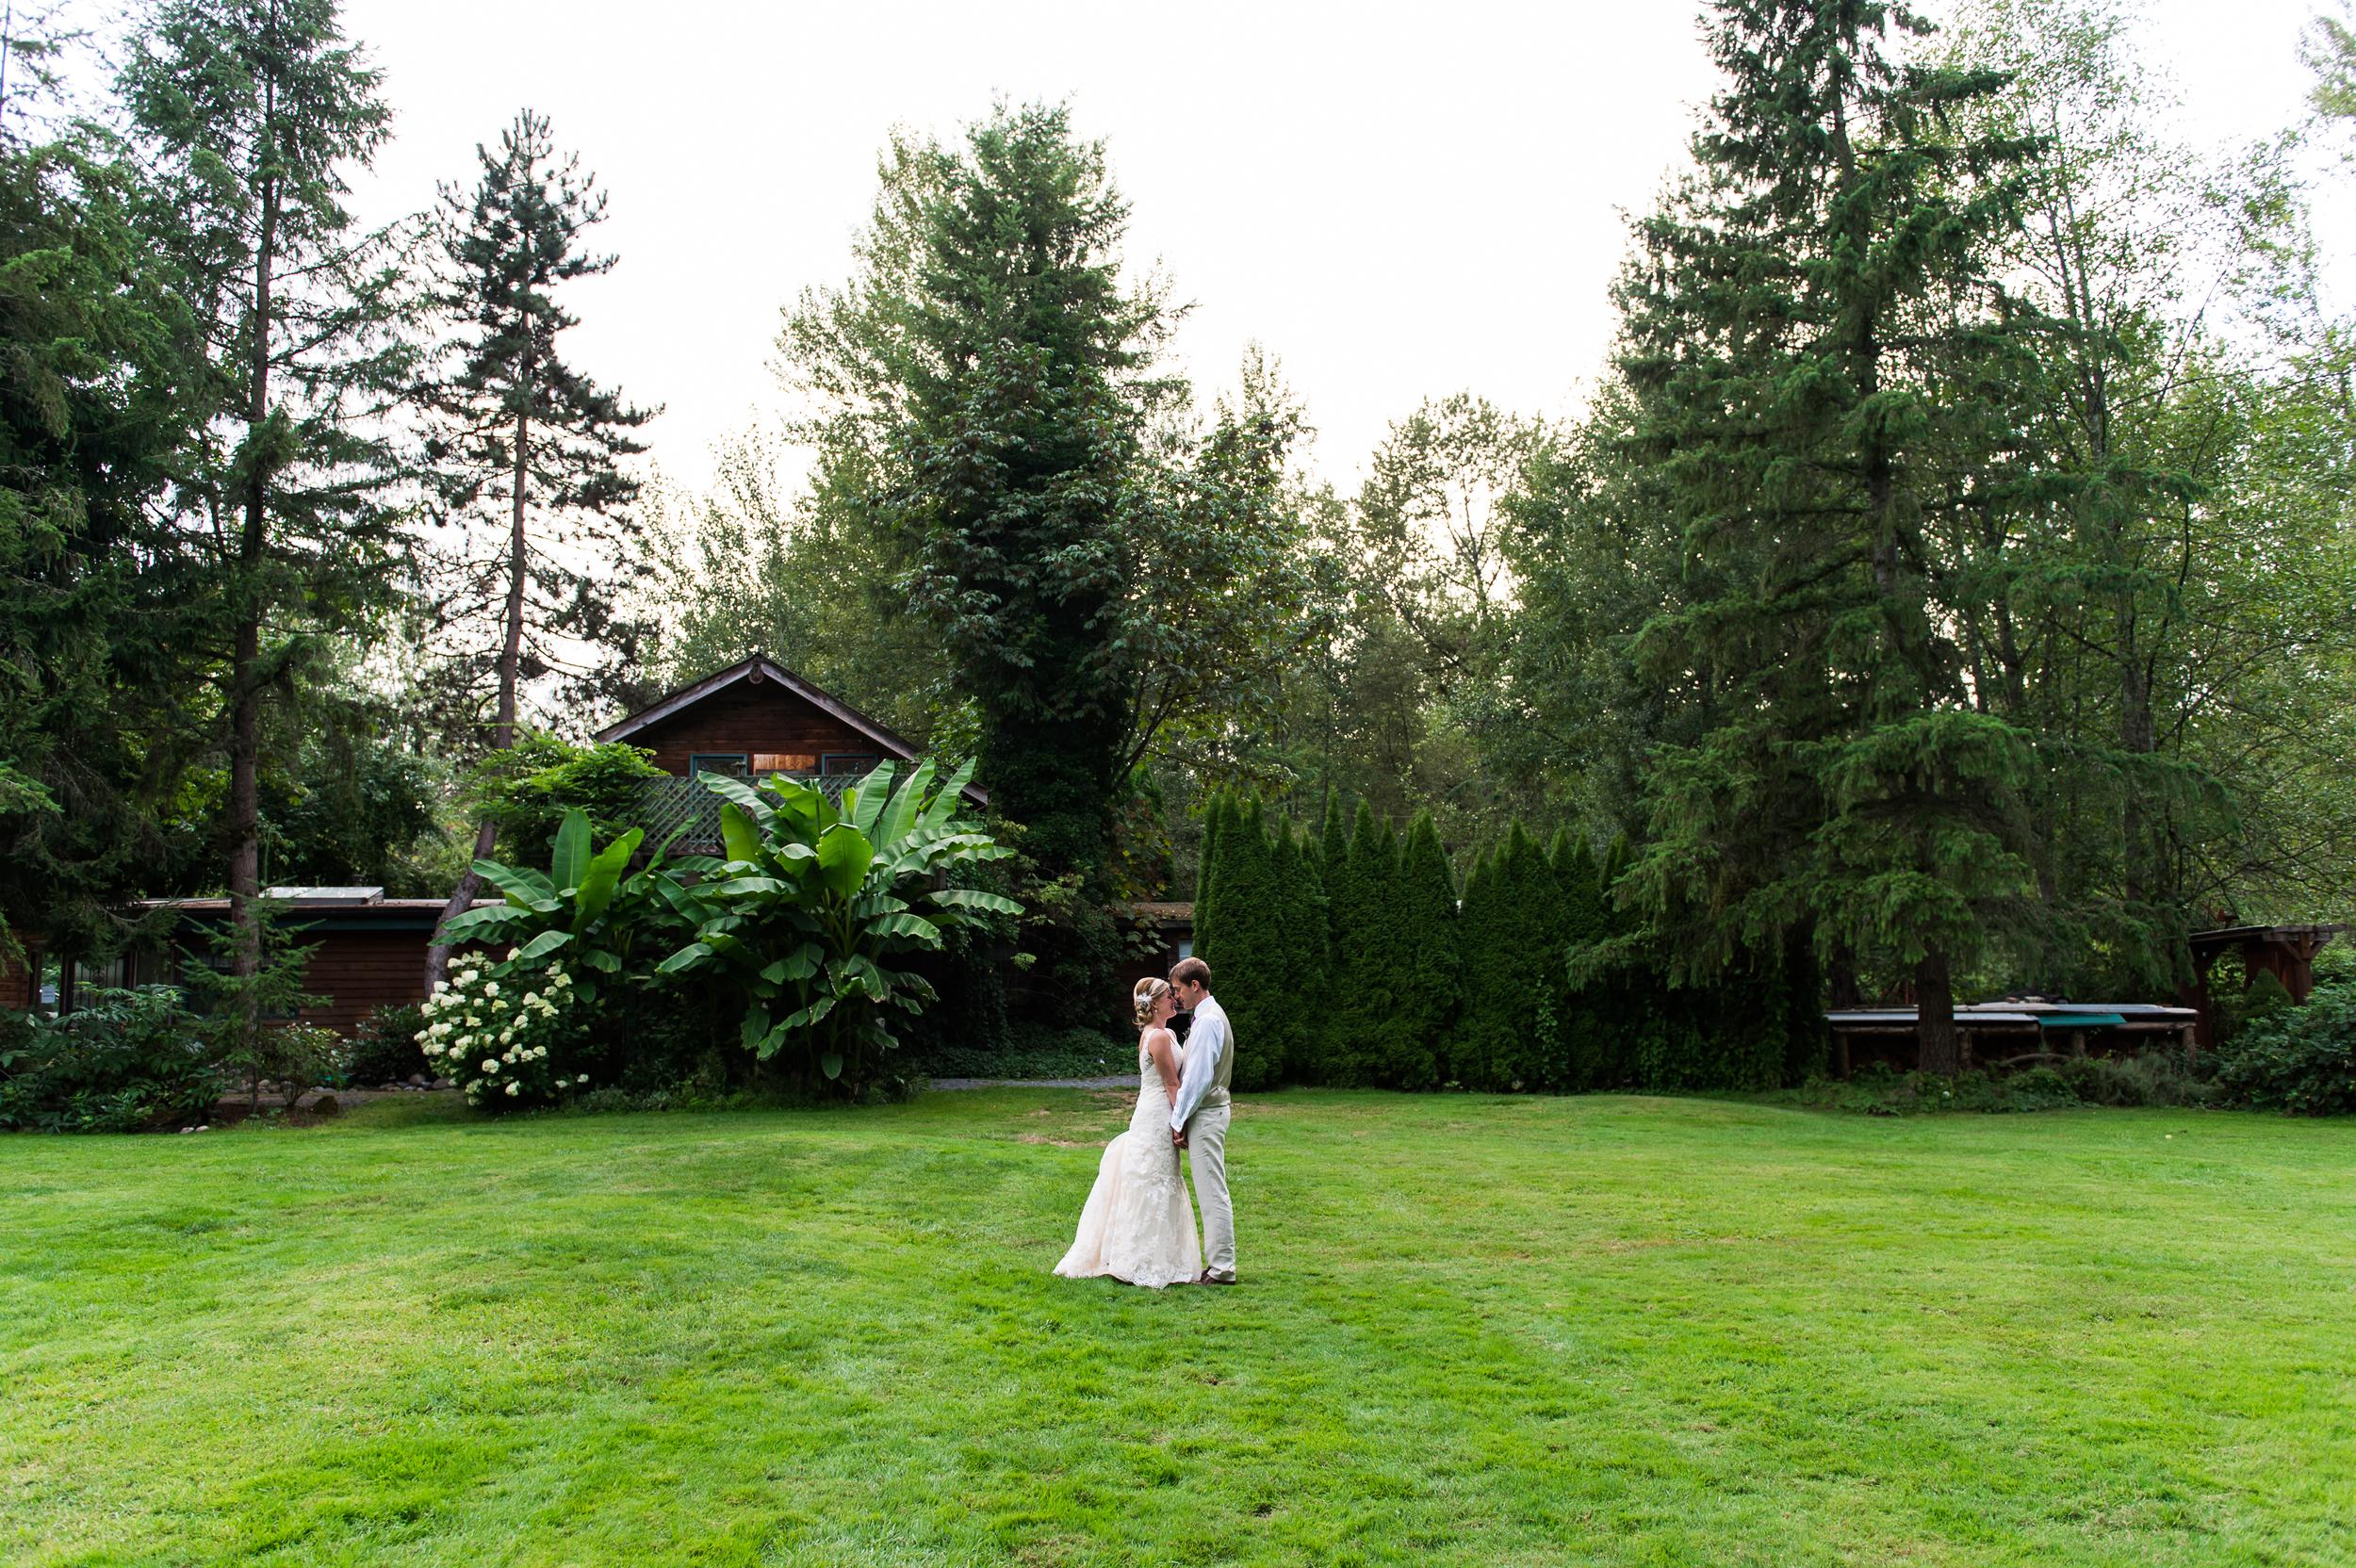 JJ-wedding-Van-Wyhe-Photography-669.jpg